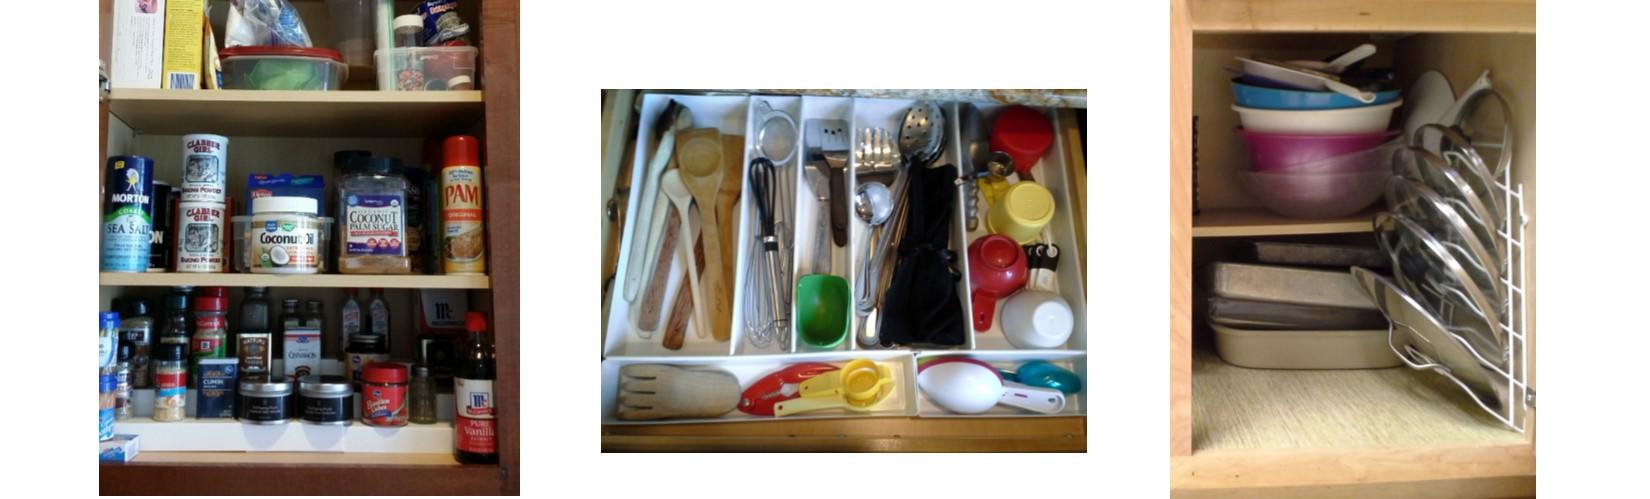 help organizing my kitchen, tips for organizing my kitchen, advice for organizing my kitchen